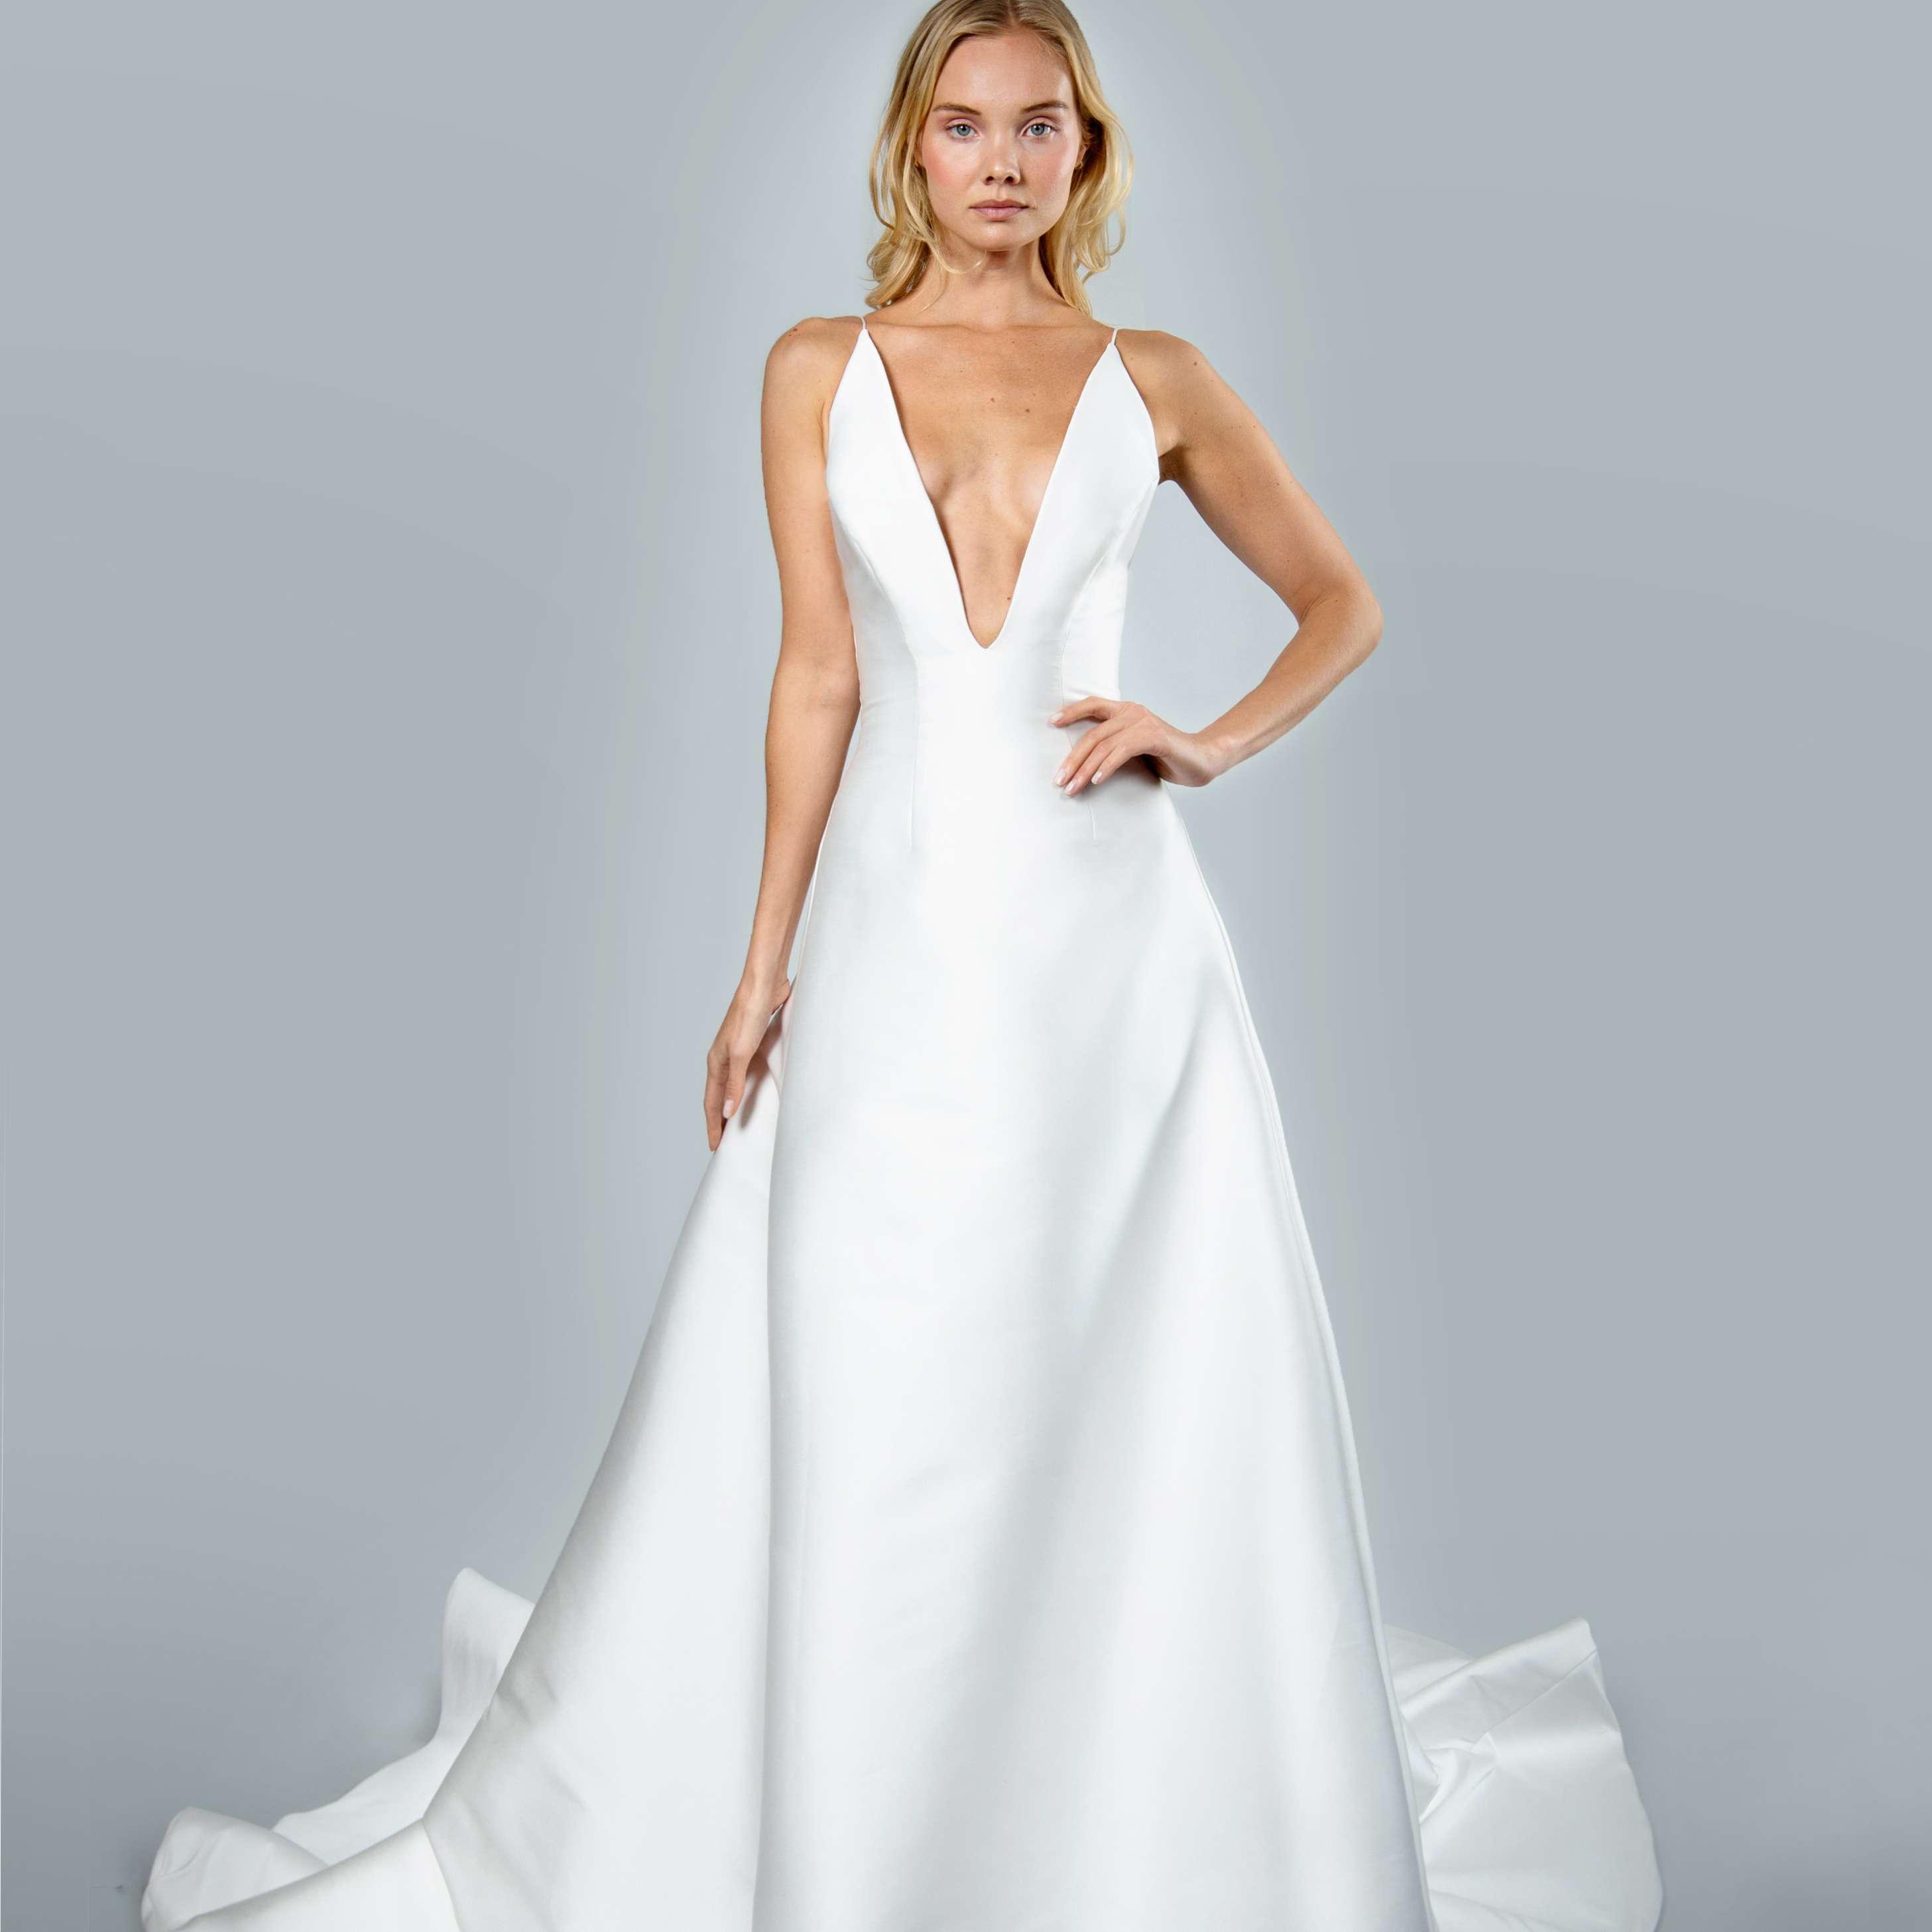 Model in plunging neckline wedding ball gown